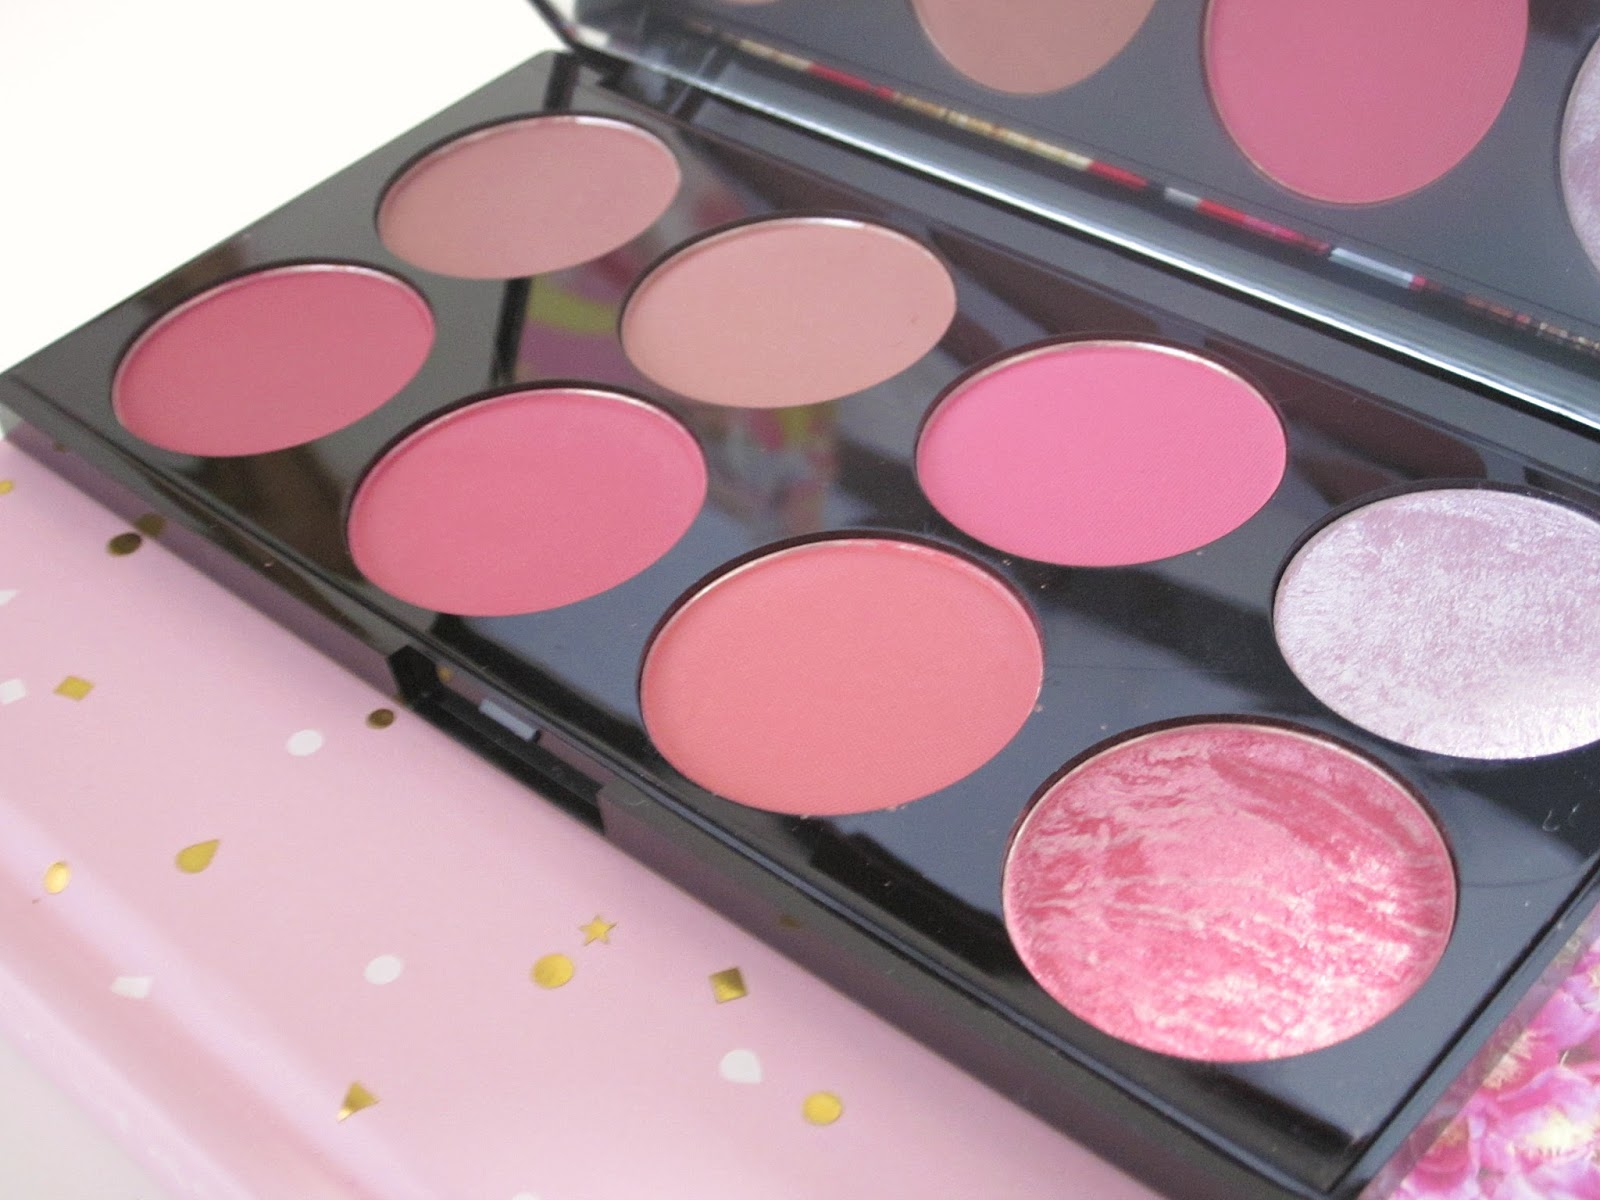 ... Palette Sugar E. The Amber Spyglass Review Make Up Revolution Ultra Blush And